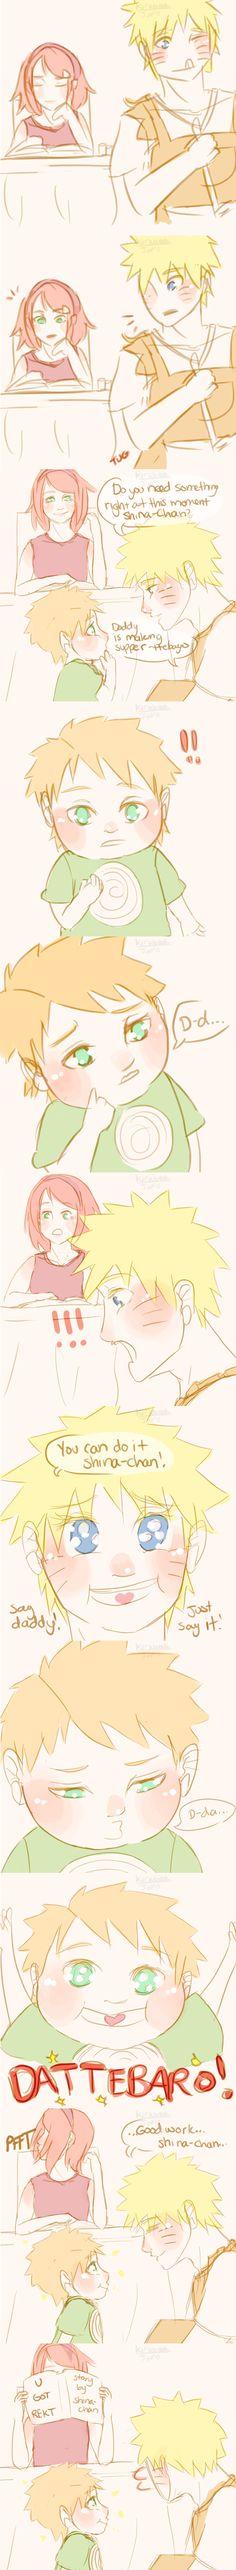 Naruto AU - Dattebaro by Kirabook on DeviantArt